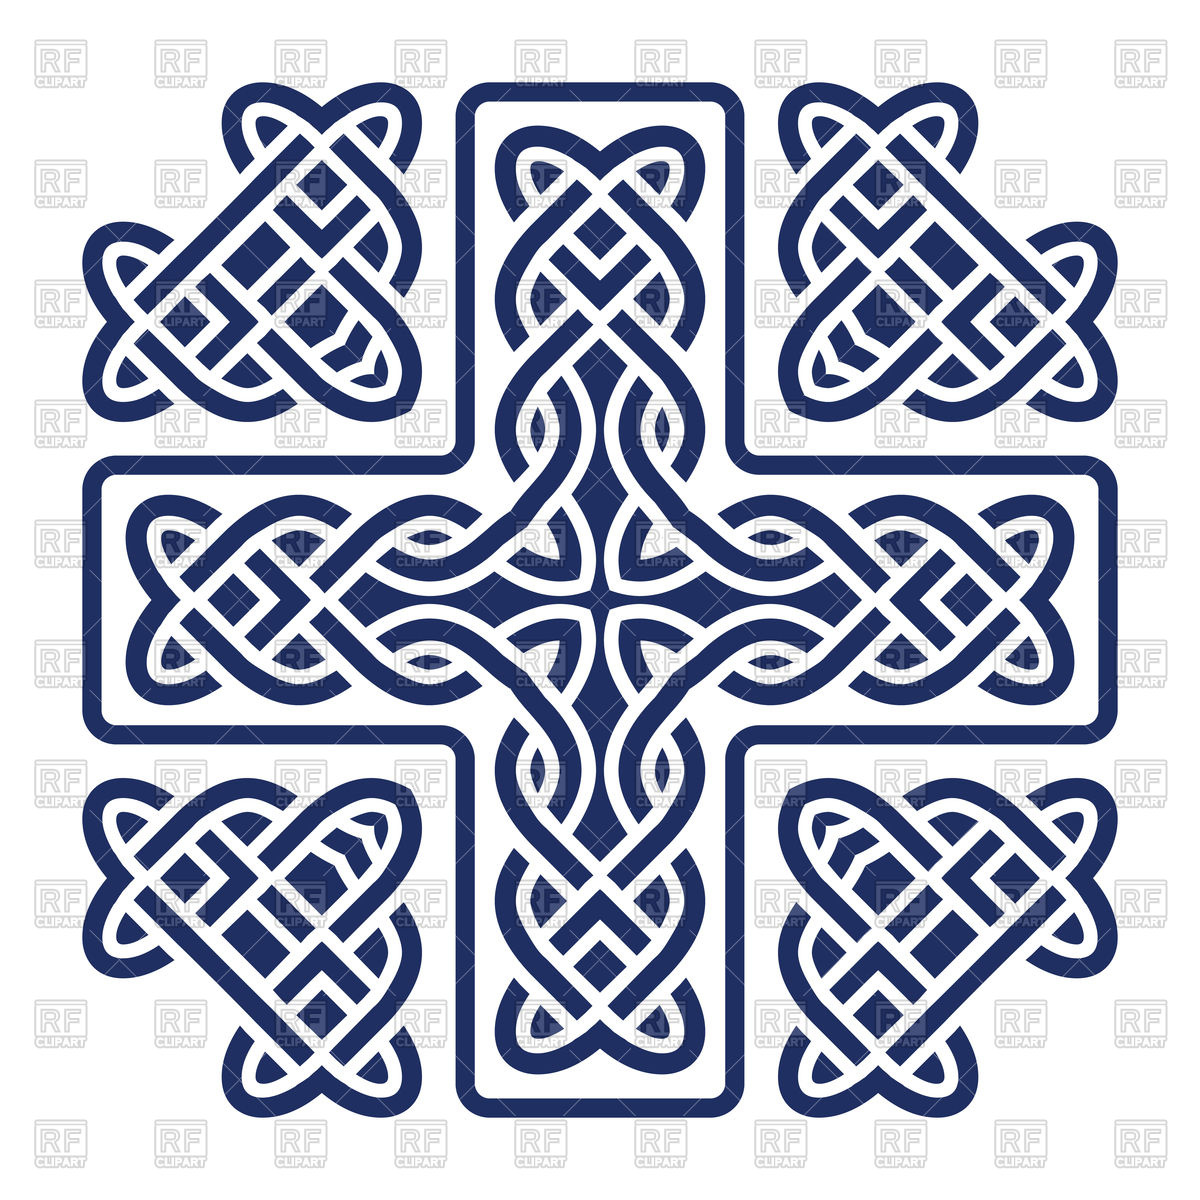 1200x1200 Celtic Knot Cross Tile Vector Image Vector Artwork Of